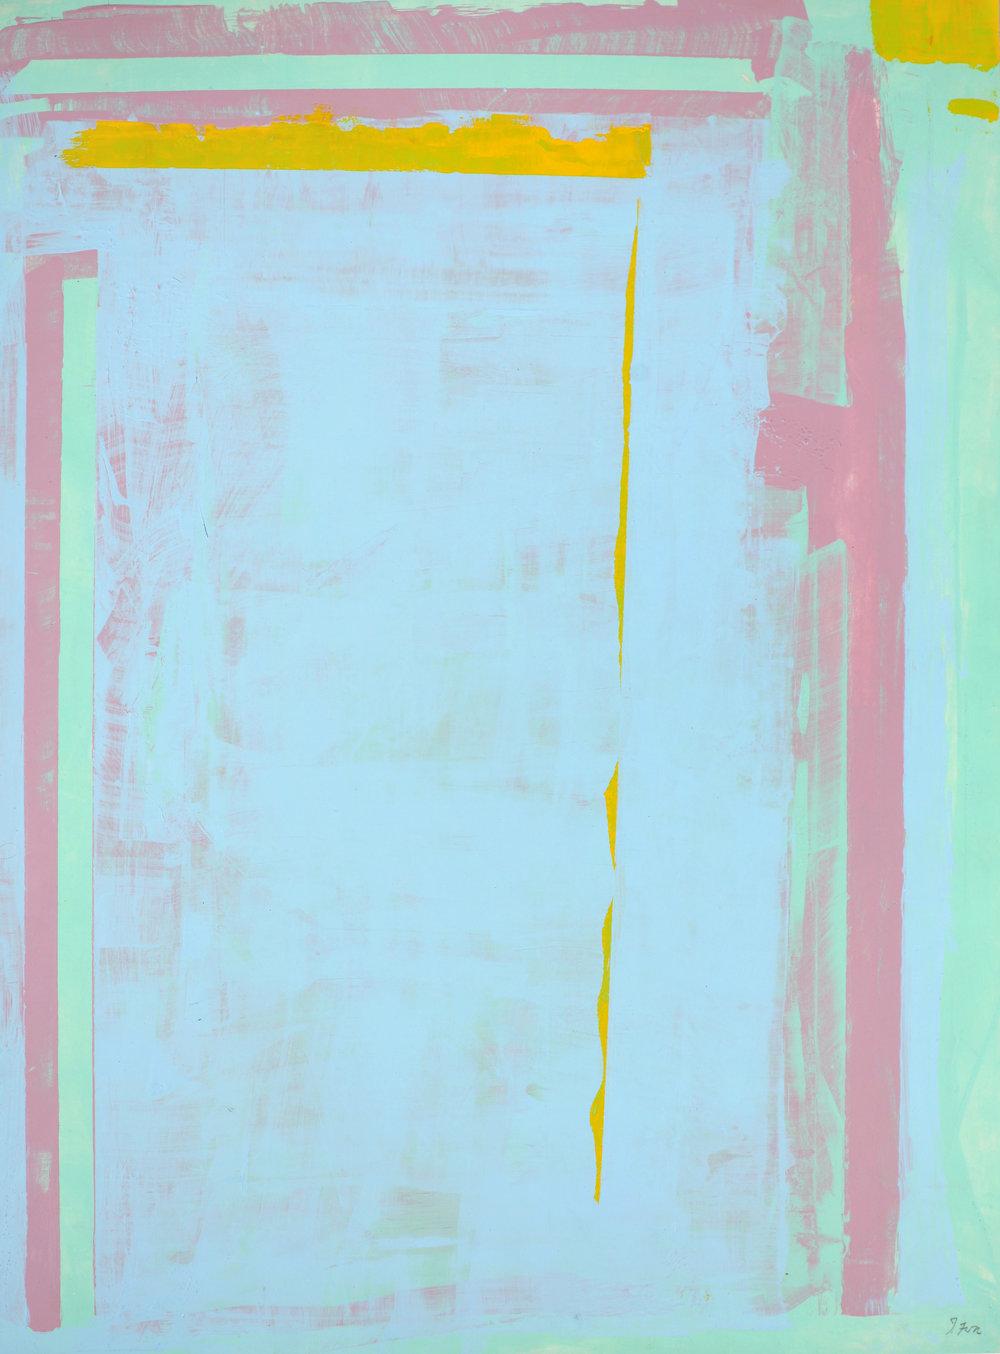 1974_Untitled_gouacheonpaper_29x21_WPNF040.jpg